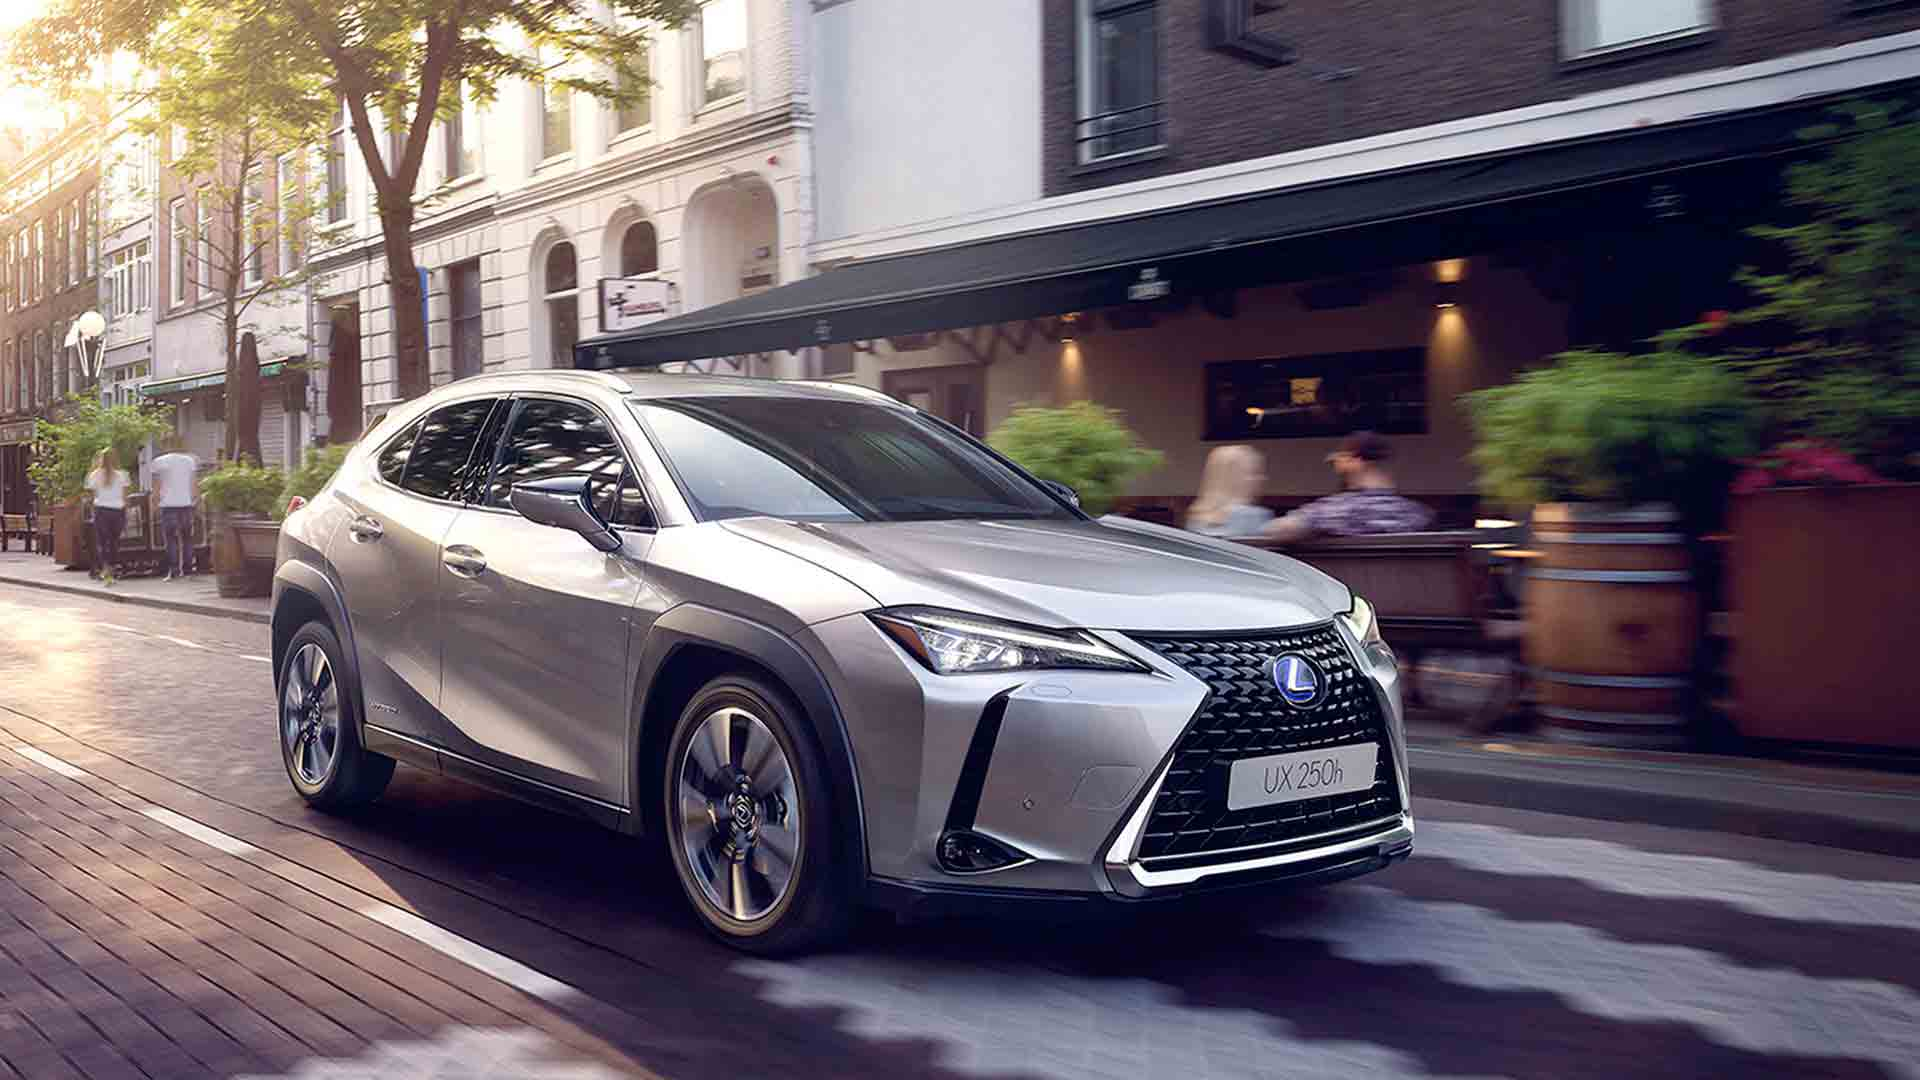 Nuevo Lexus UX 250h 2018 hero asset